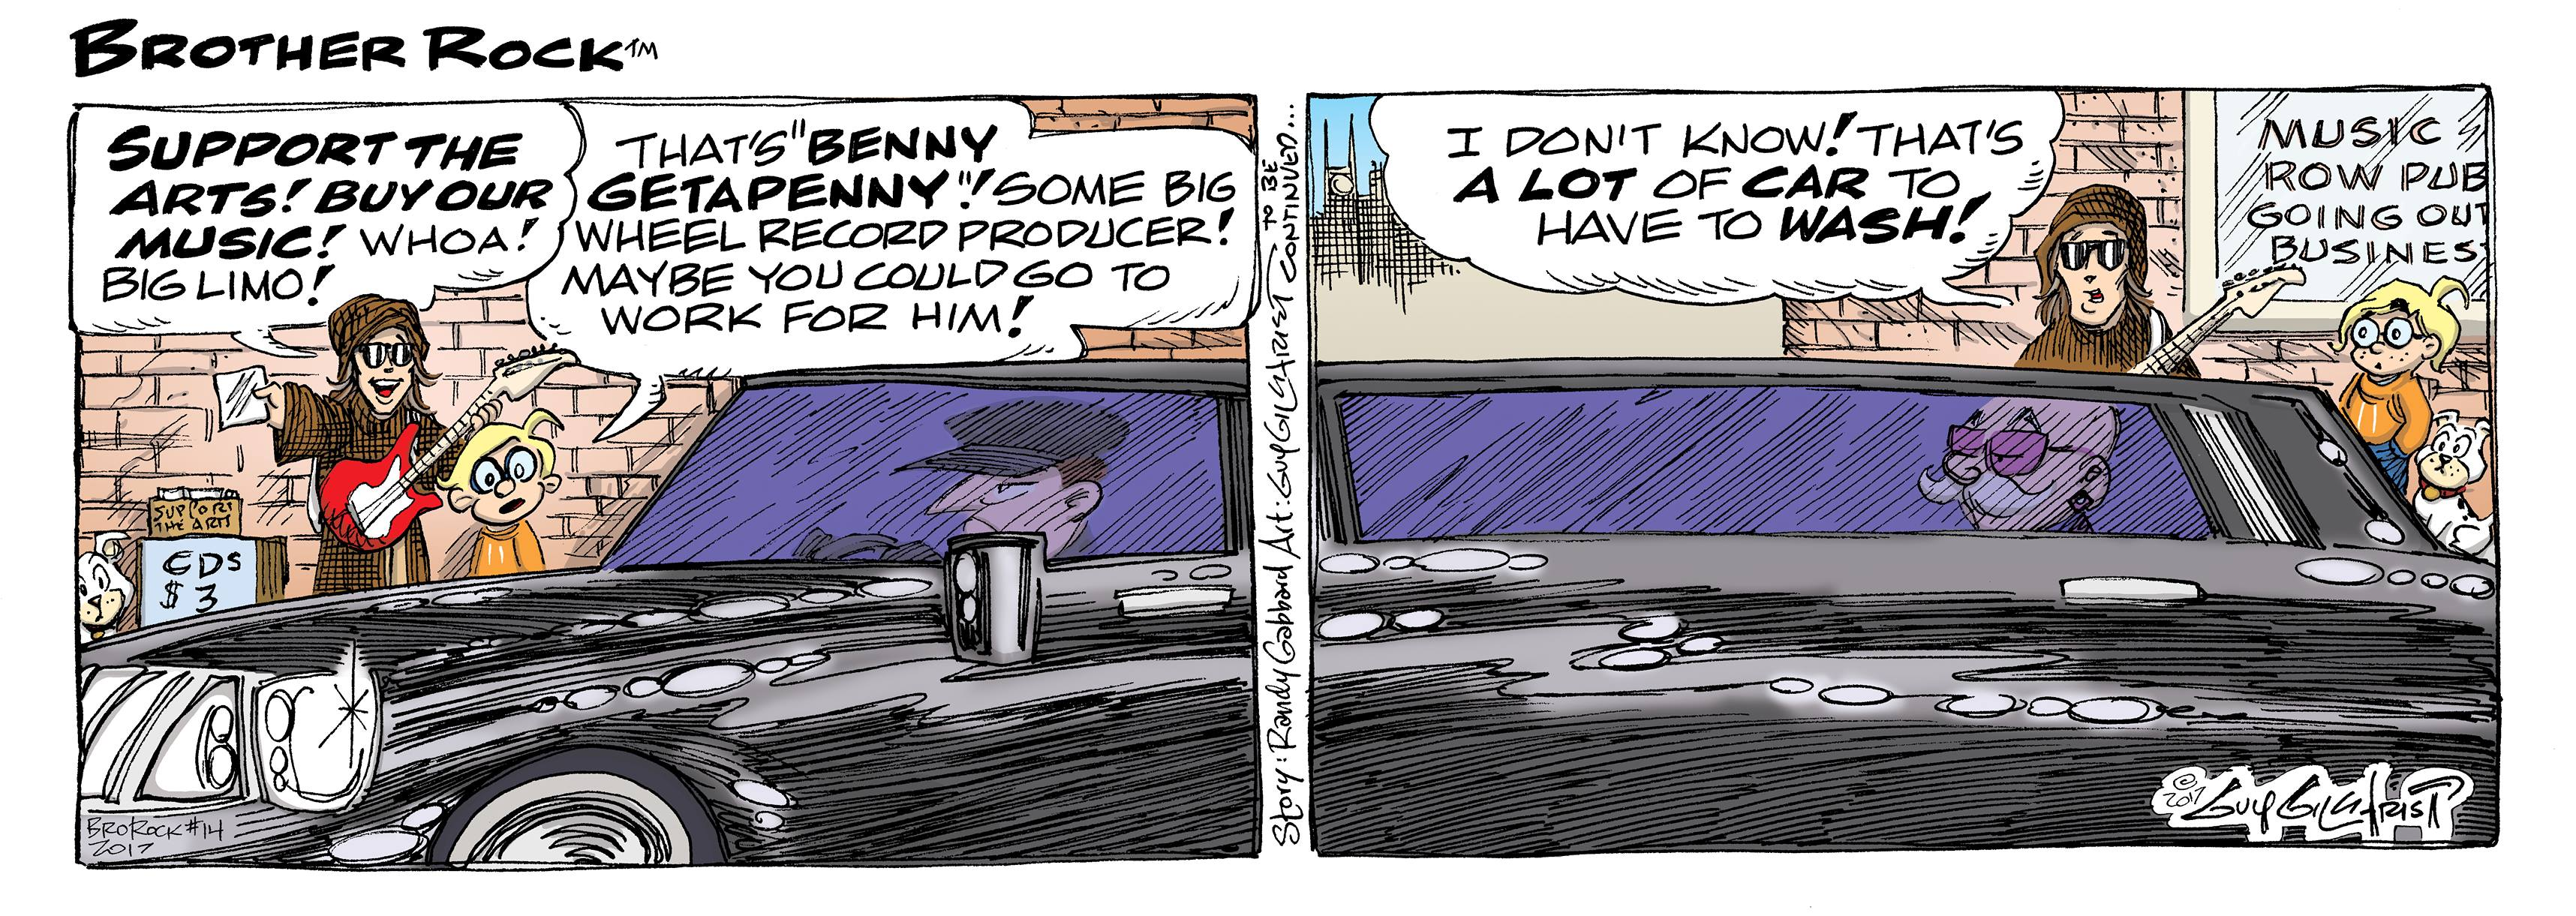 The Strip – Randy Gabbard's Brother Rock